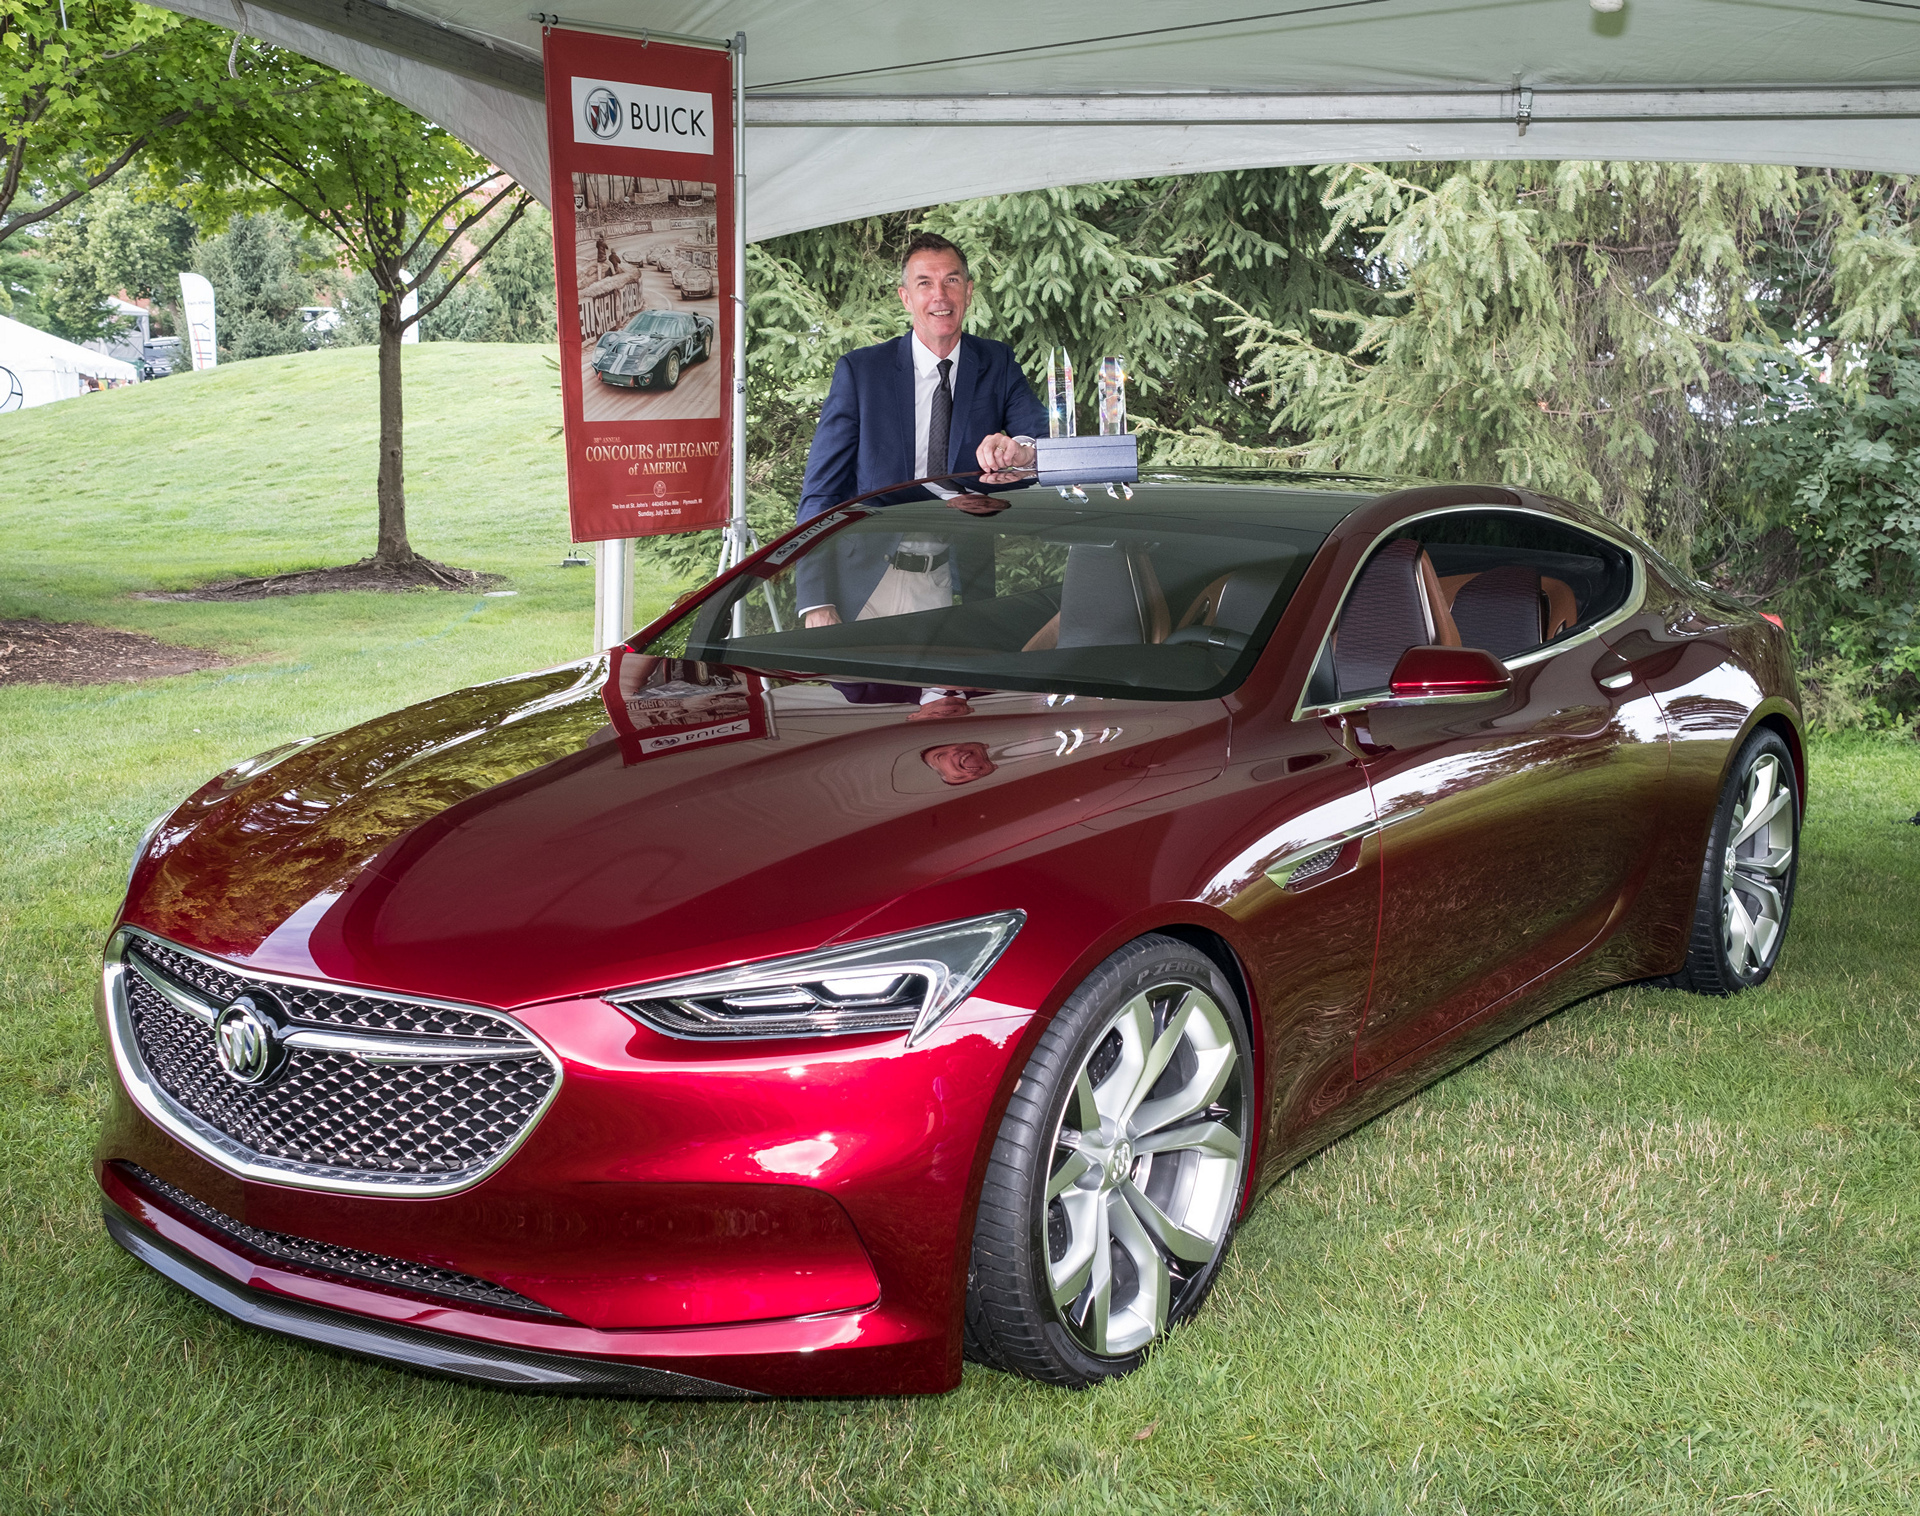 Buick Avista Concept Wins Two Awards At Concours d'Elegance General Motors © General Motors